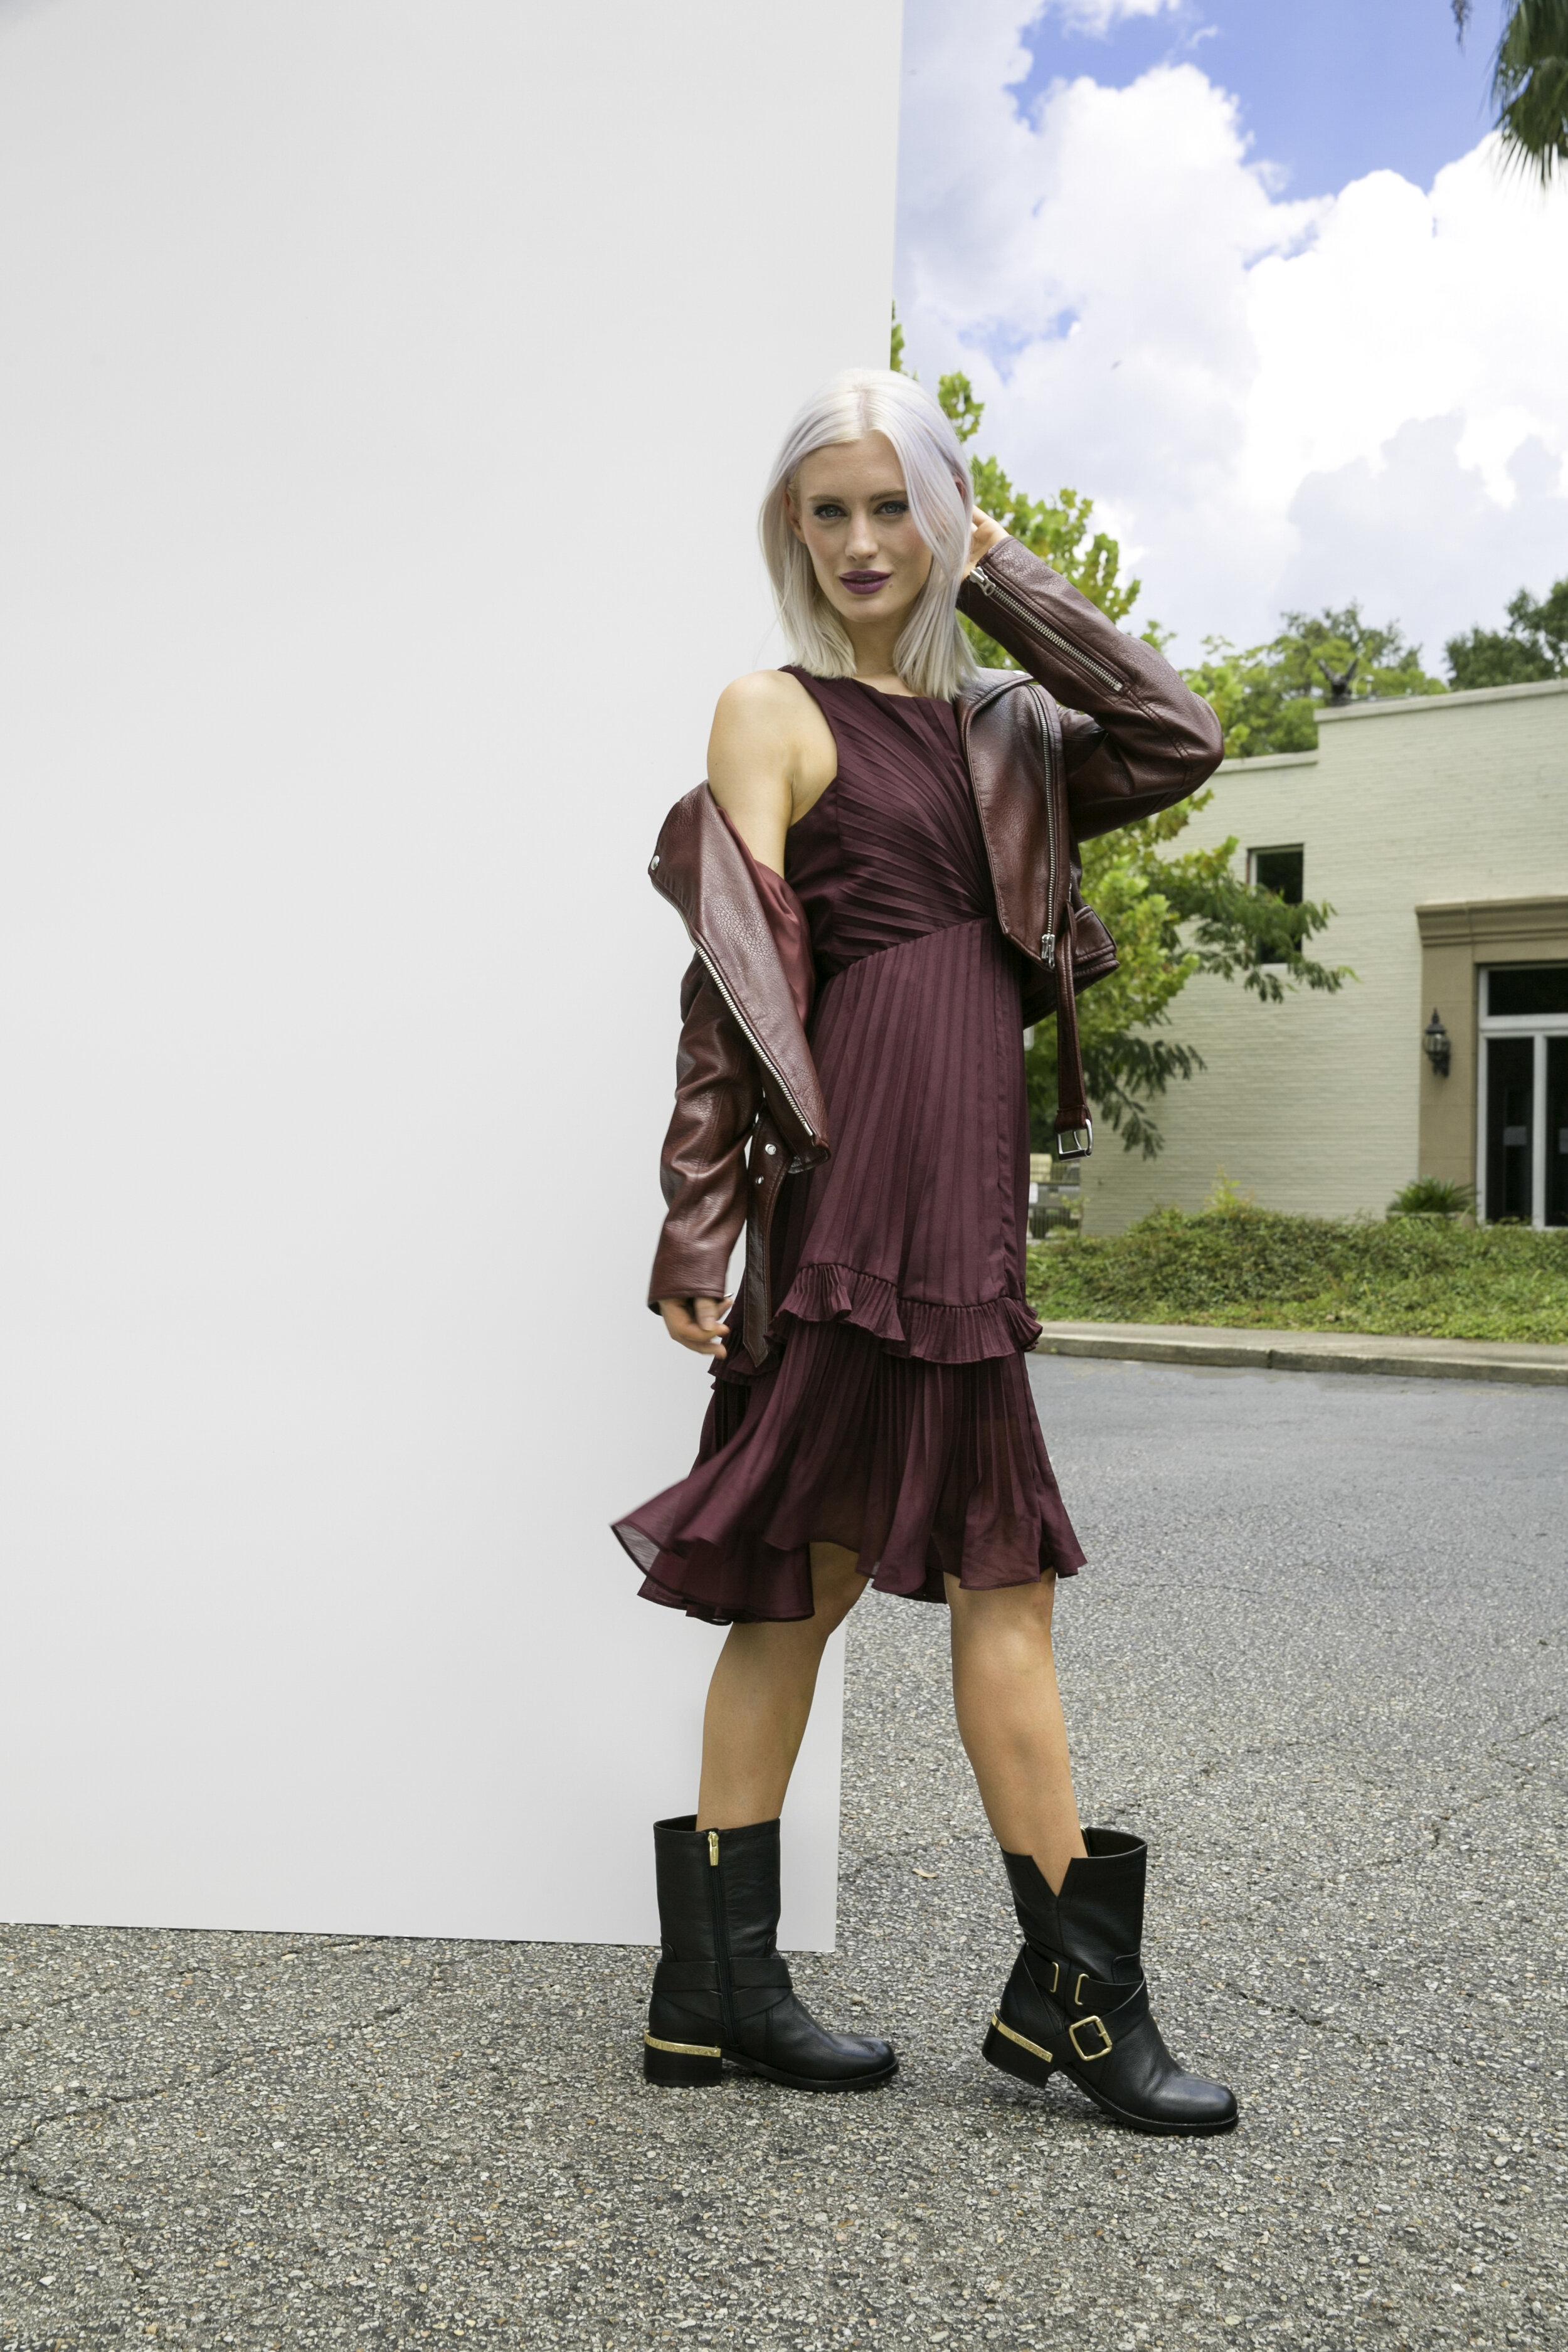 Dress (berry), $495; DUH Pensacola, 251.439.0640. Leather Jacket, $189; Debra's; 251.343.7463. Boots, $169; Dillard's, 251.471.1551.